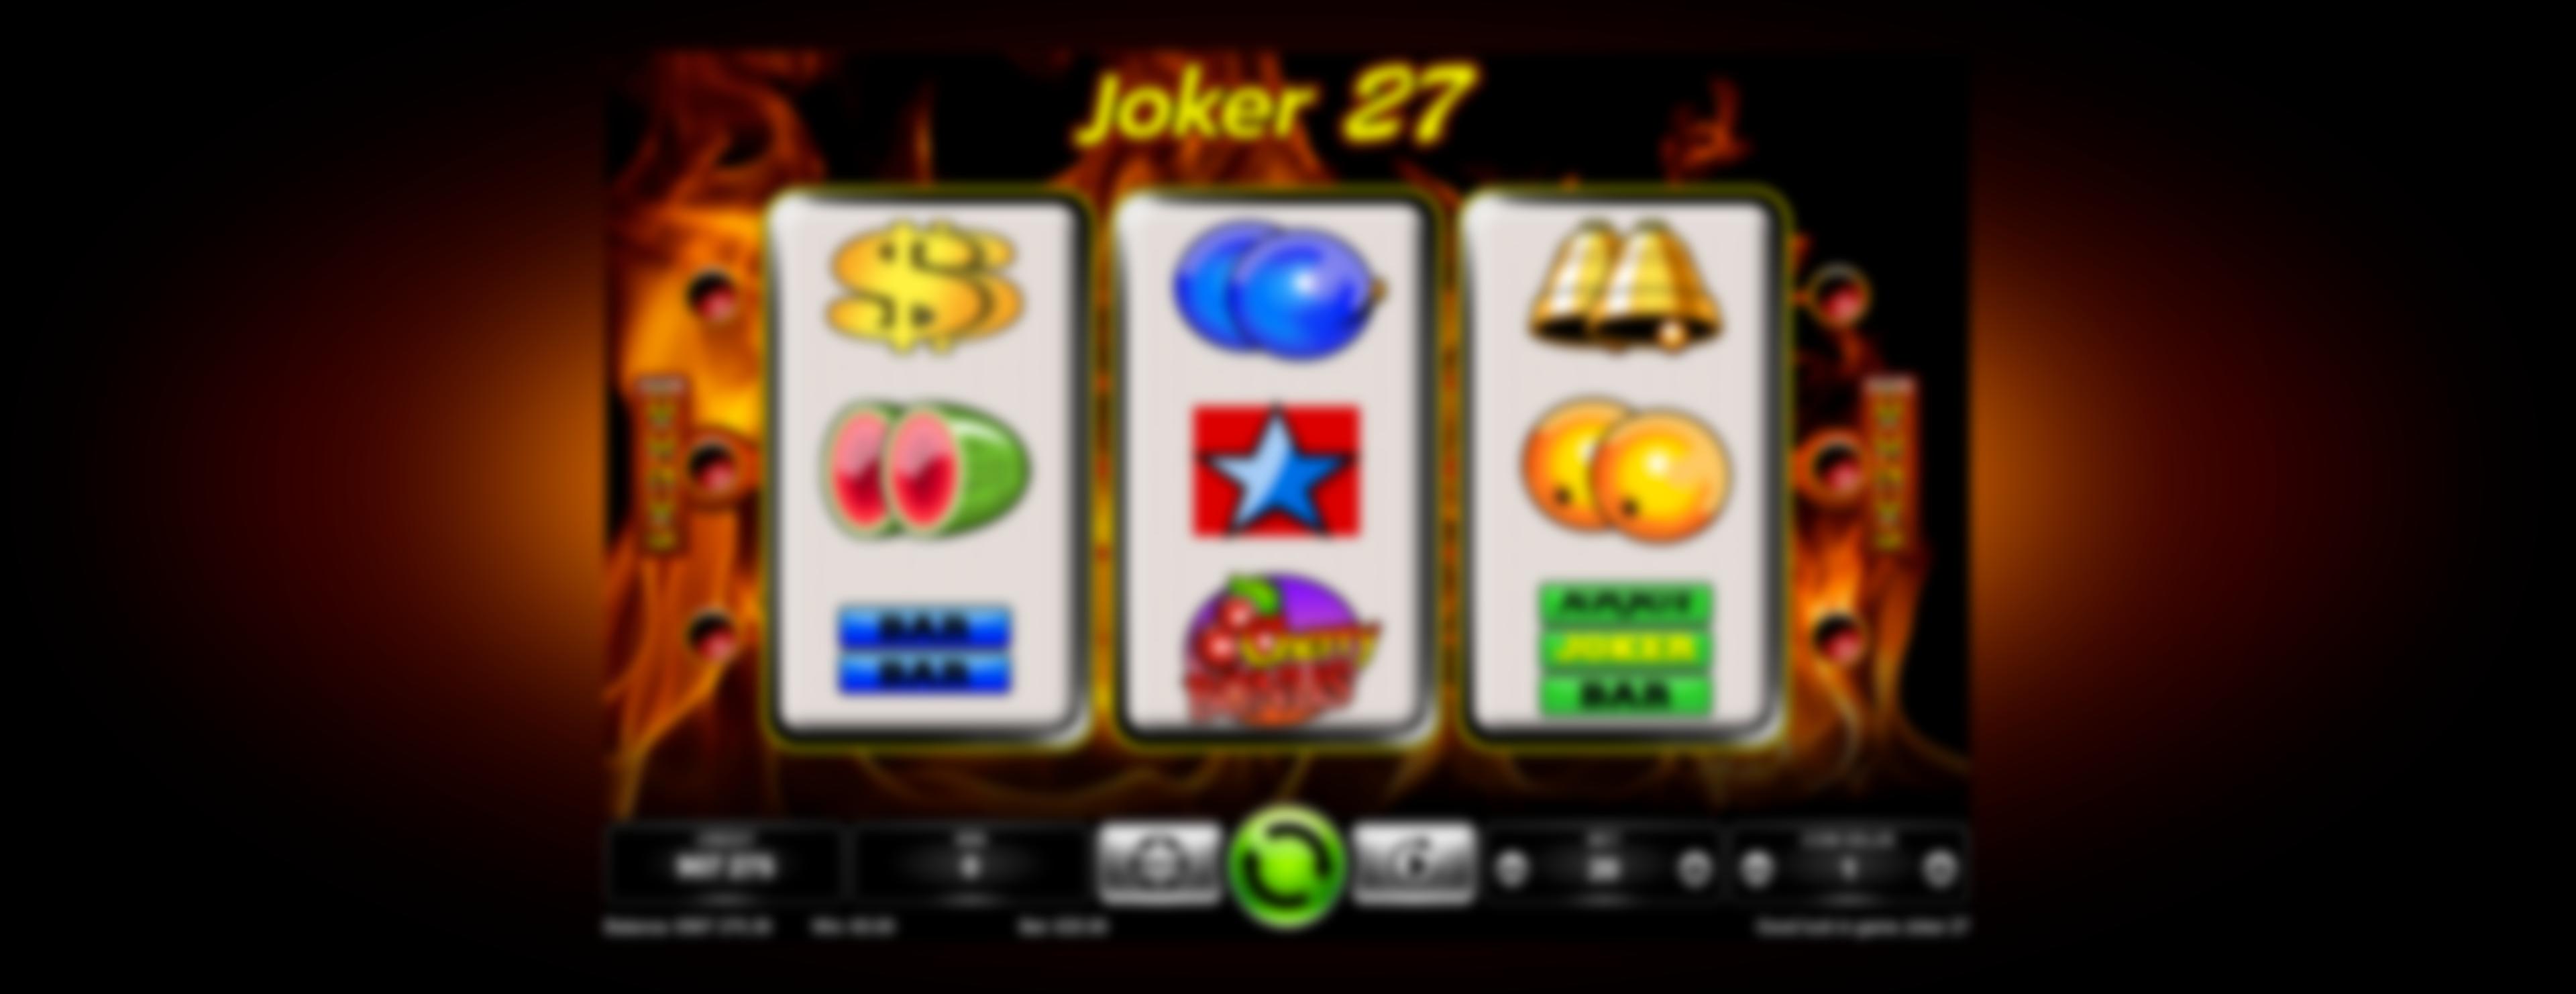 Joker 27 main photo